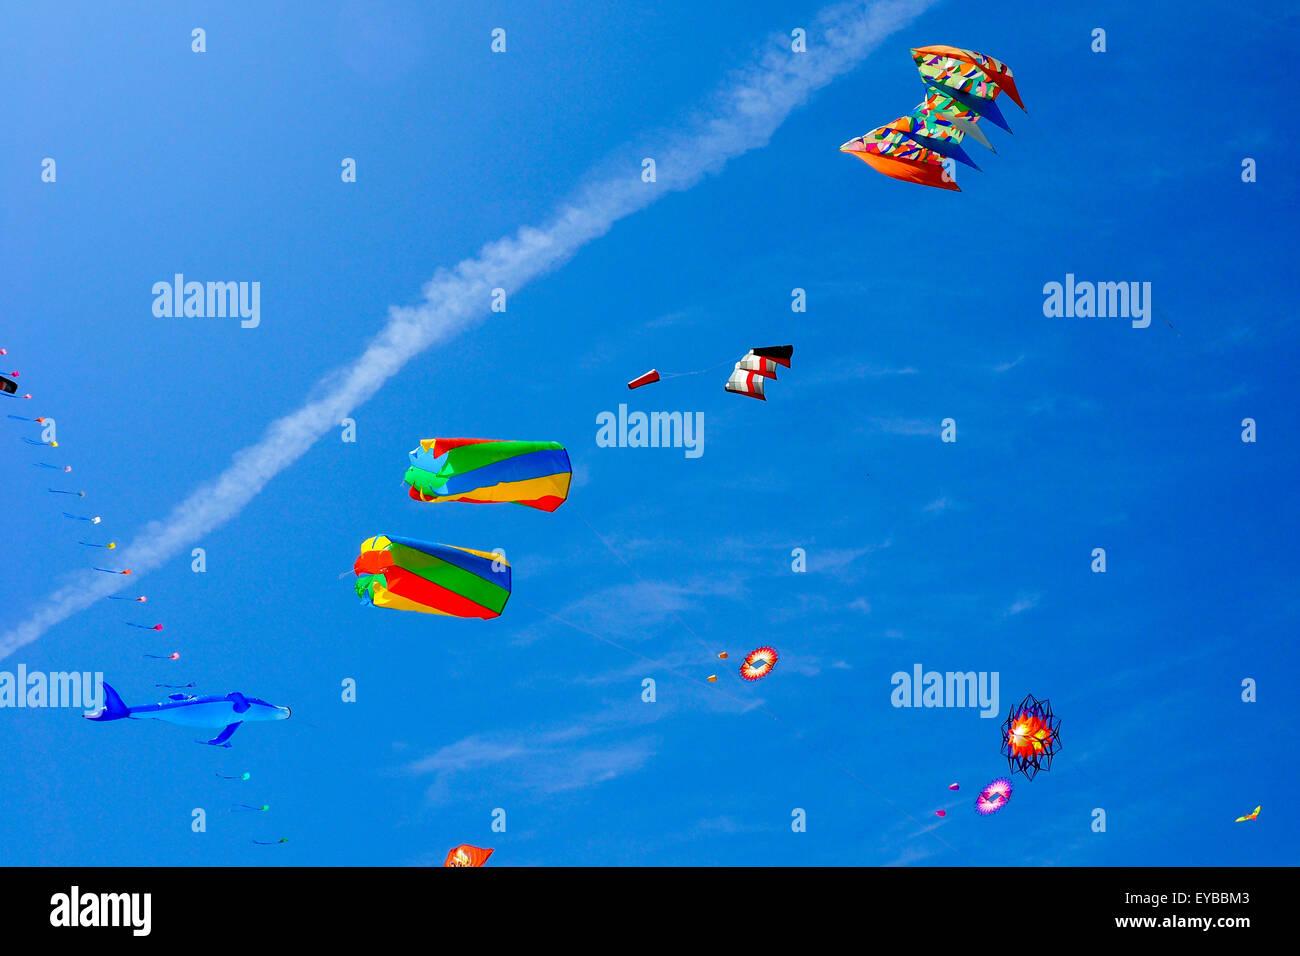 Colourful and animal shaped kites flying. - Stock Image